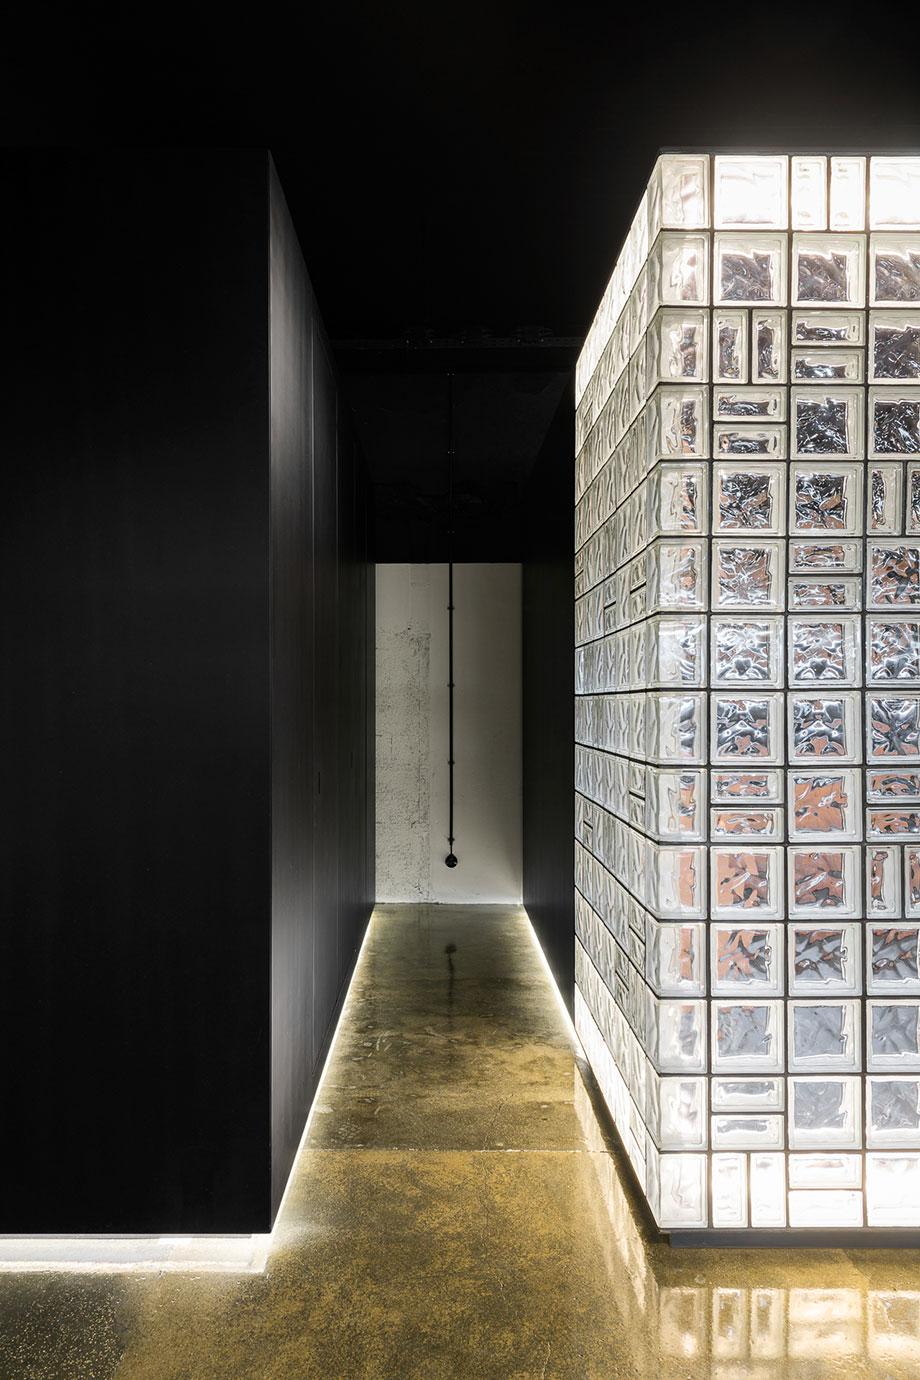 atelier das artes 16 de mmvarquitectos (9) - foto ricardo oliveira alves